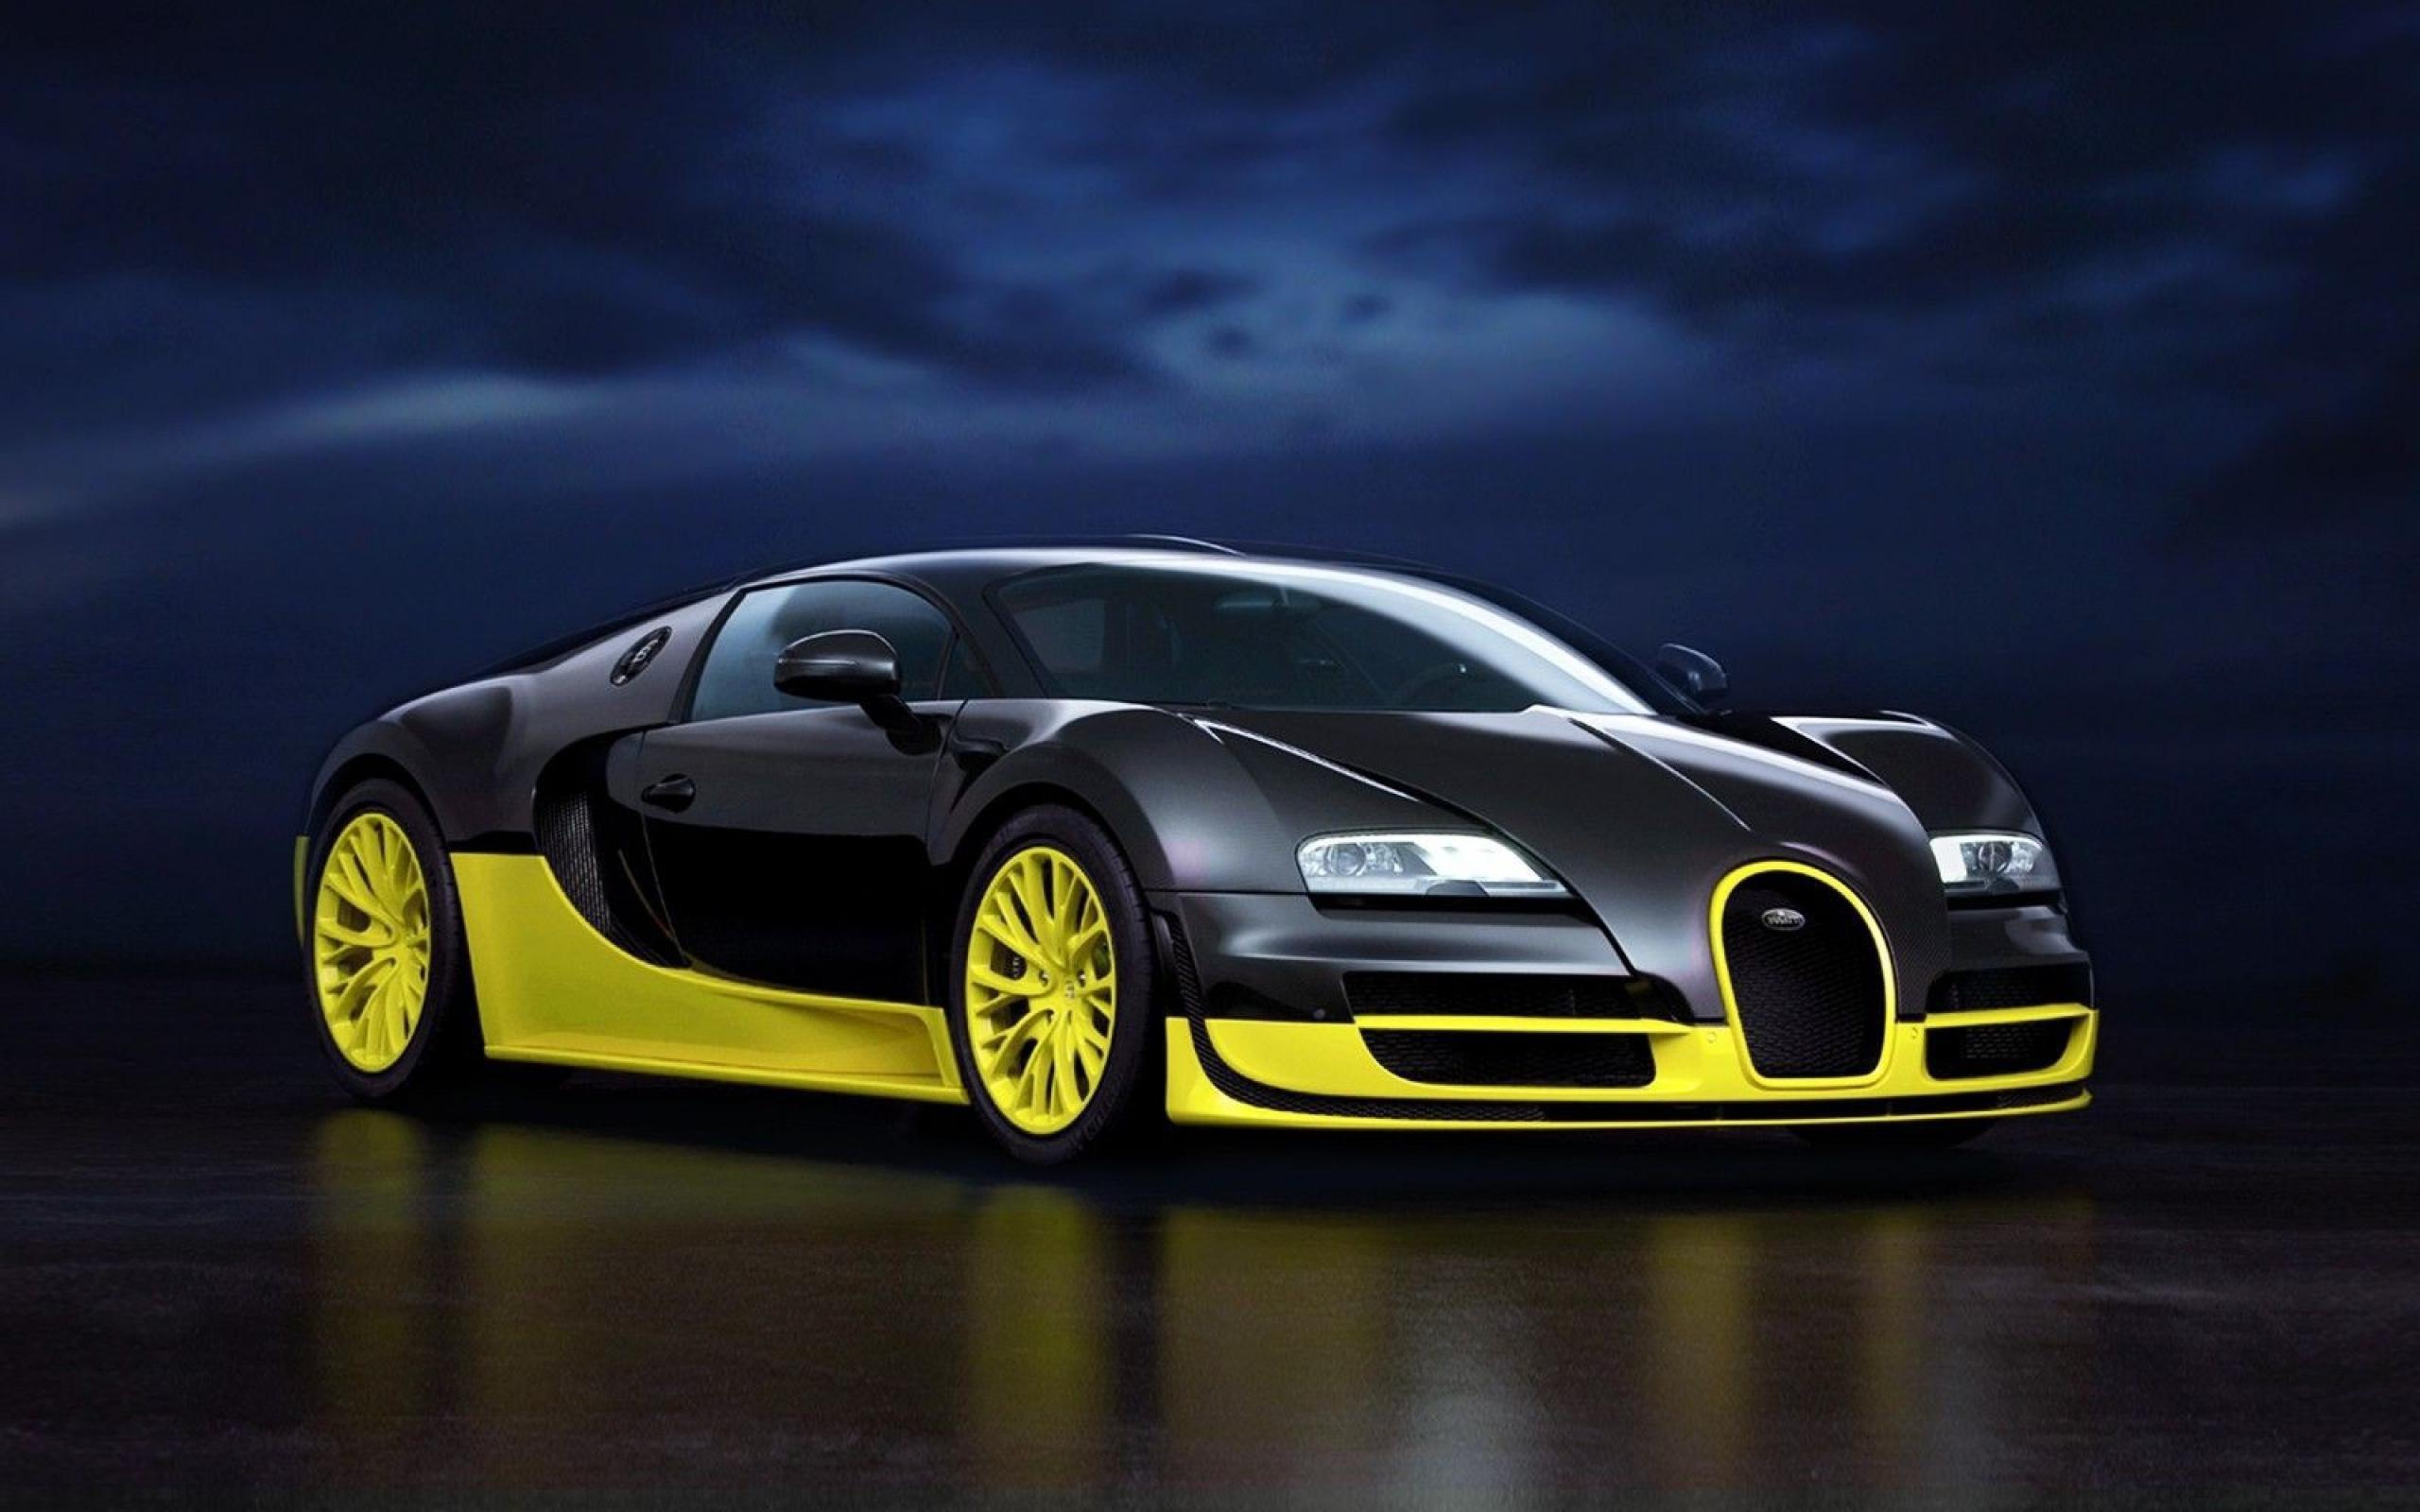 Auto   Bugatti   Others Bugatti Cars Bugatti Veyron 042745 19jpg 2560x1600